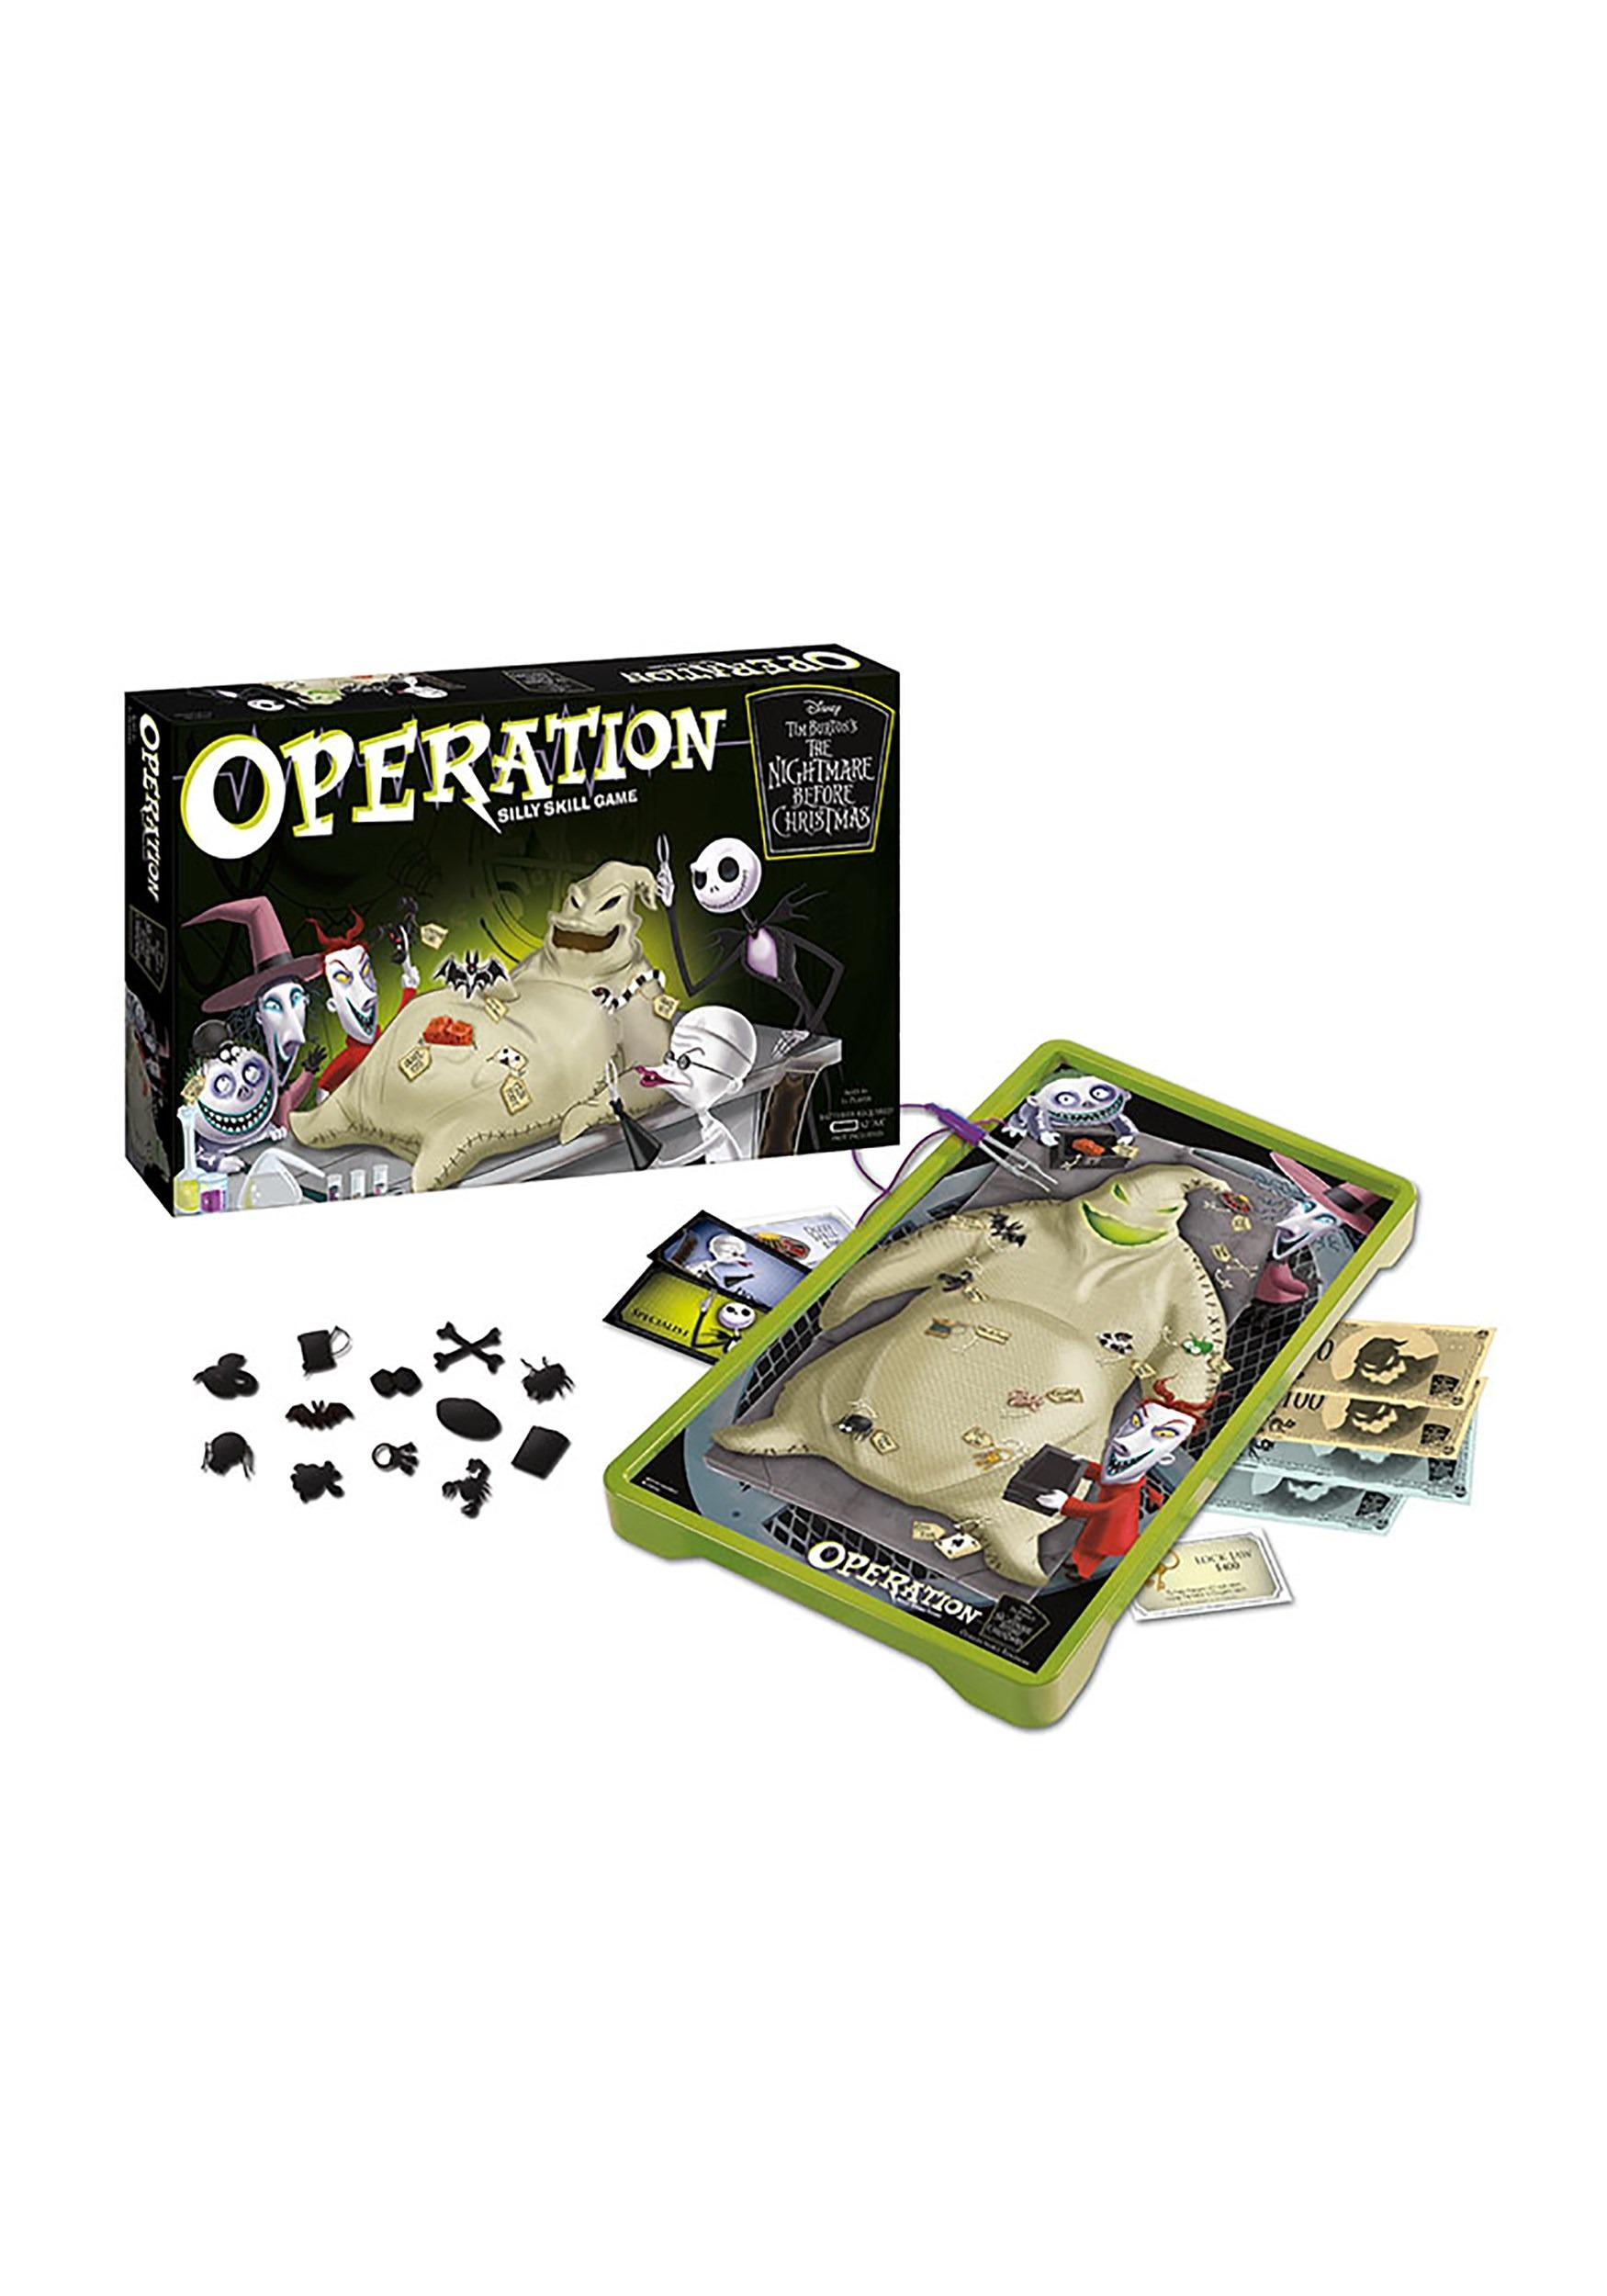 Tim Burton's The Nightmare Before Christmas OPERATION game USPOP004-261